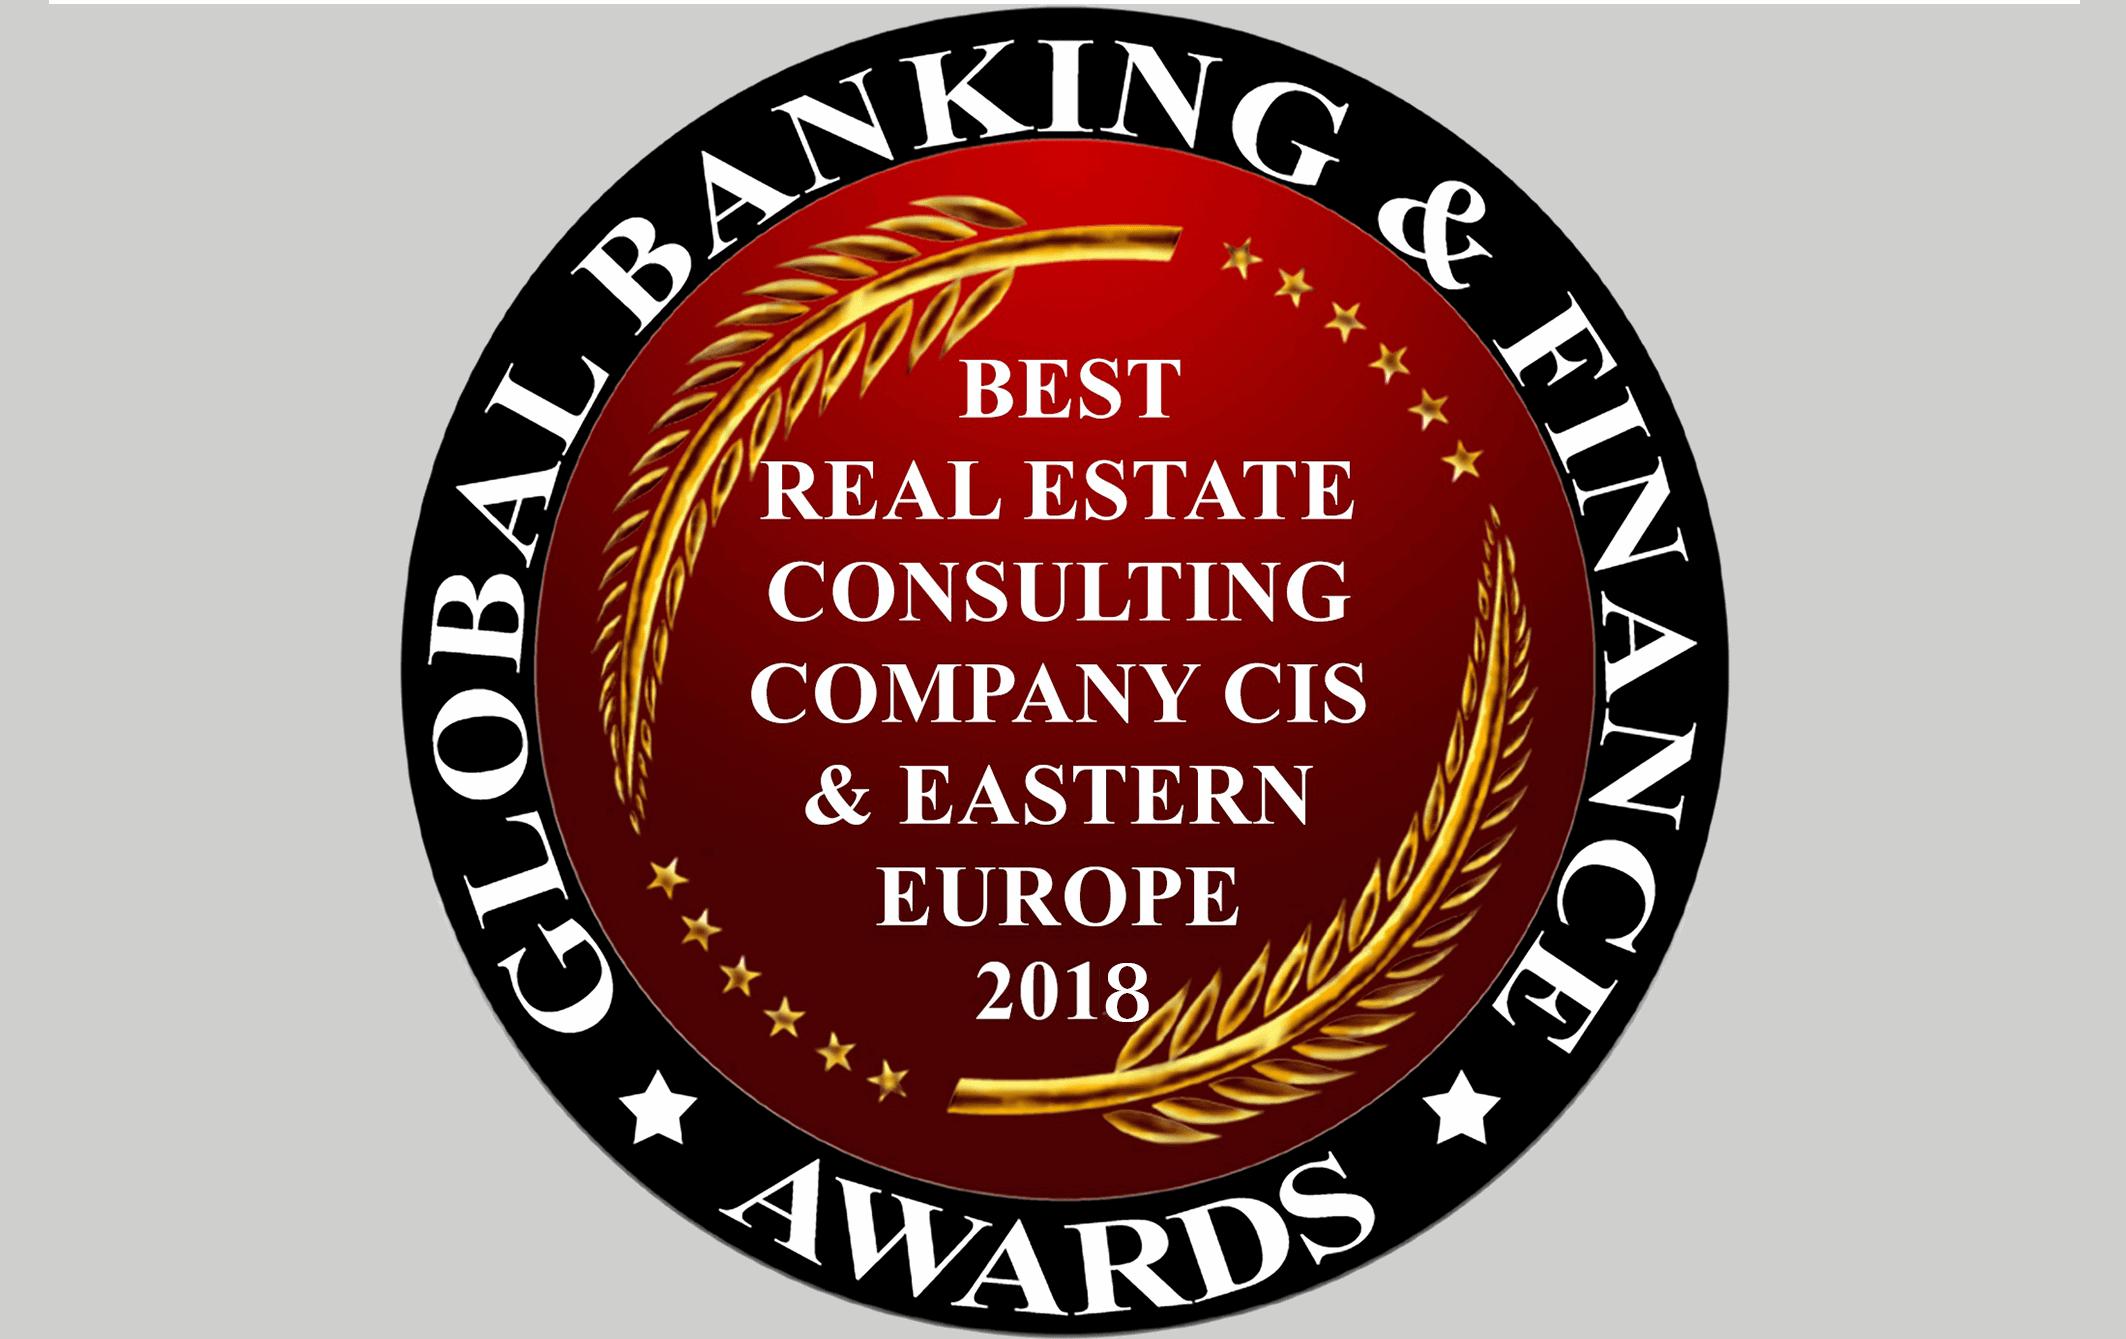 Global Banking & Finance Awards 2018